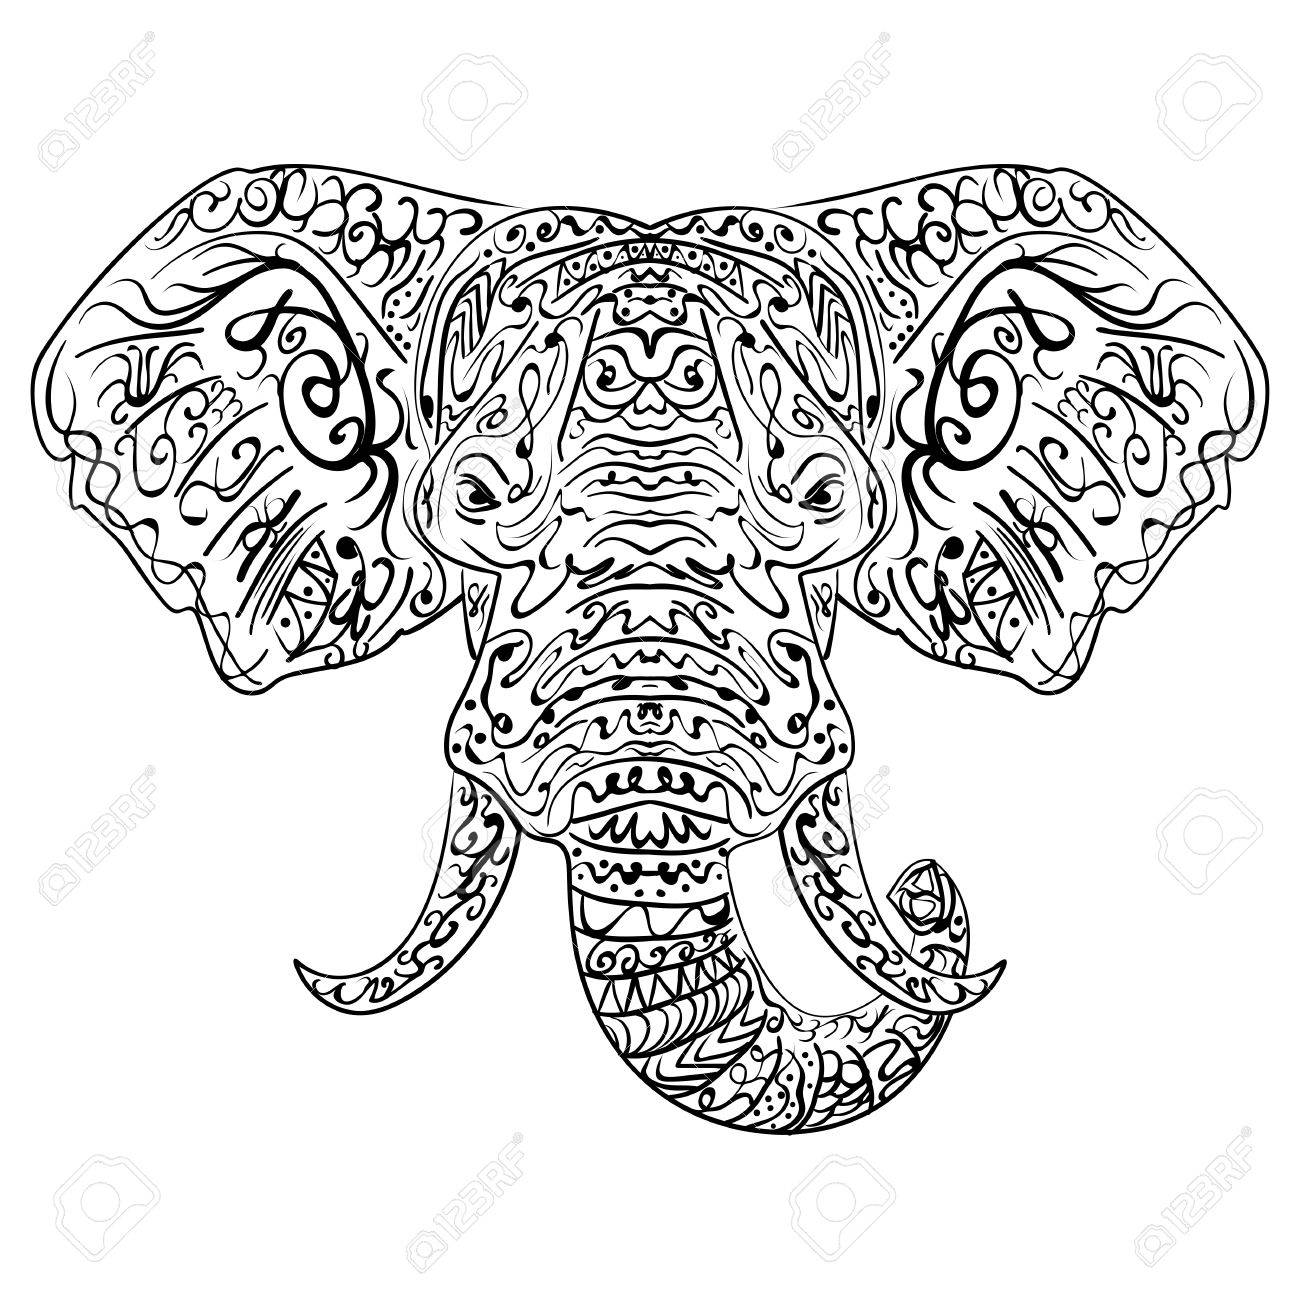 Ethnische Indischen Elefanten Boho Paisley Handskizze Für